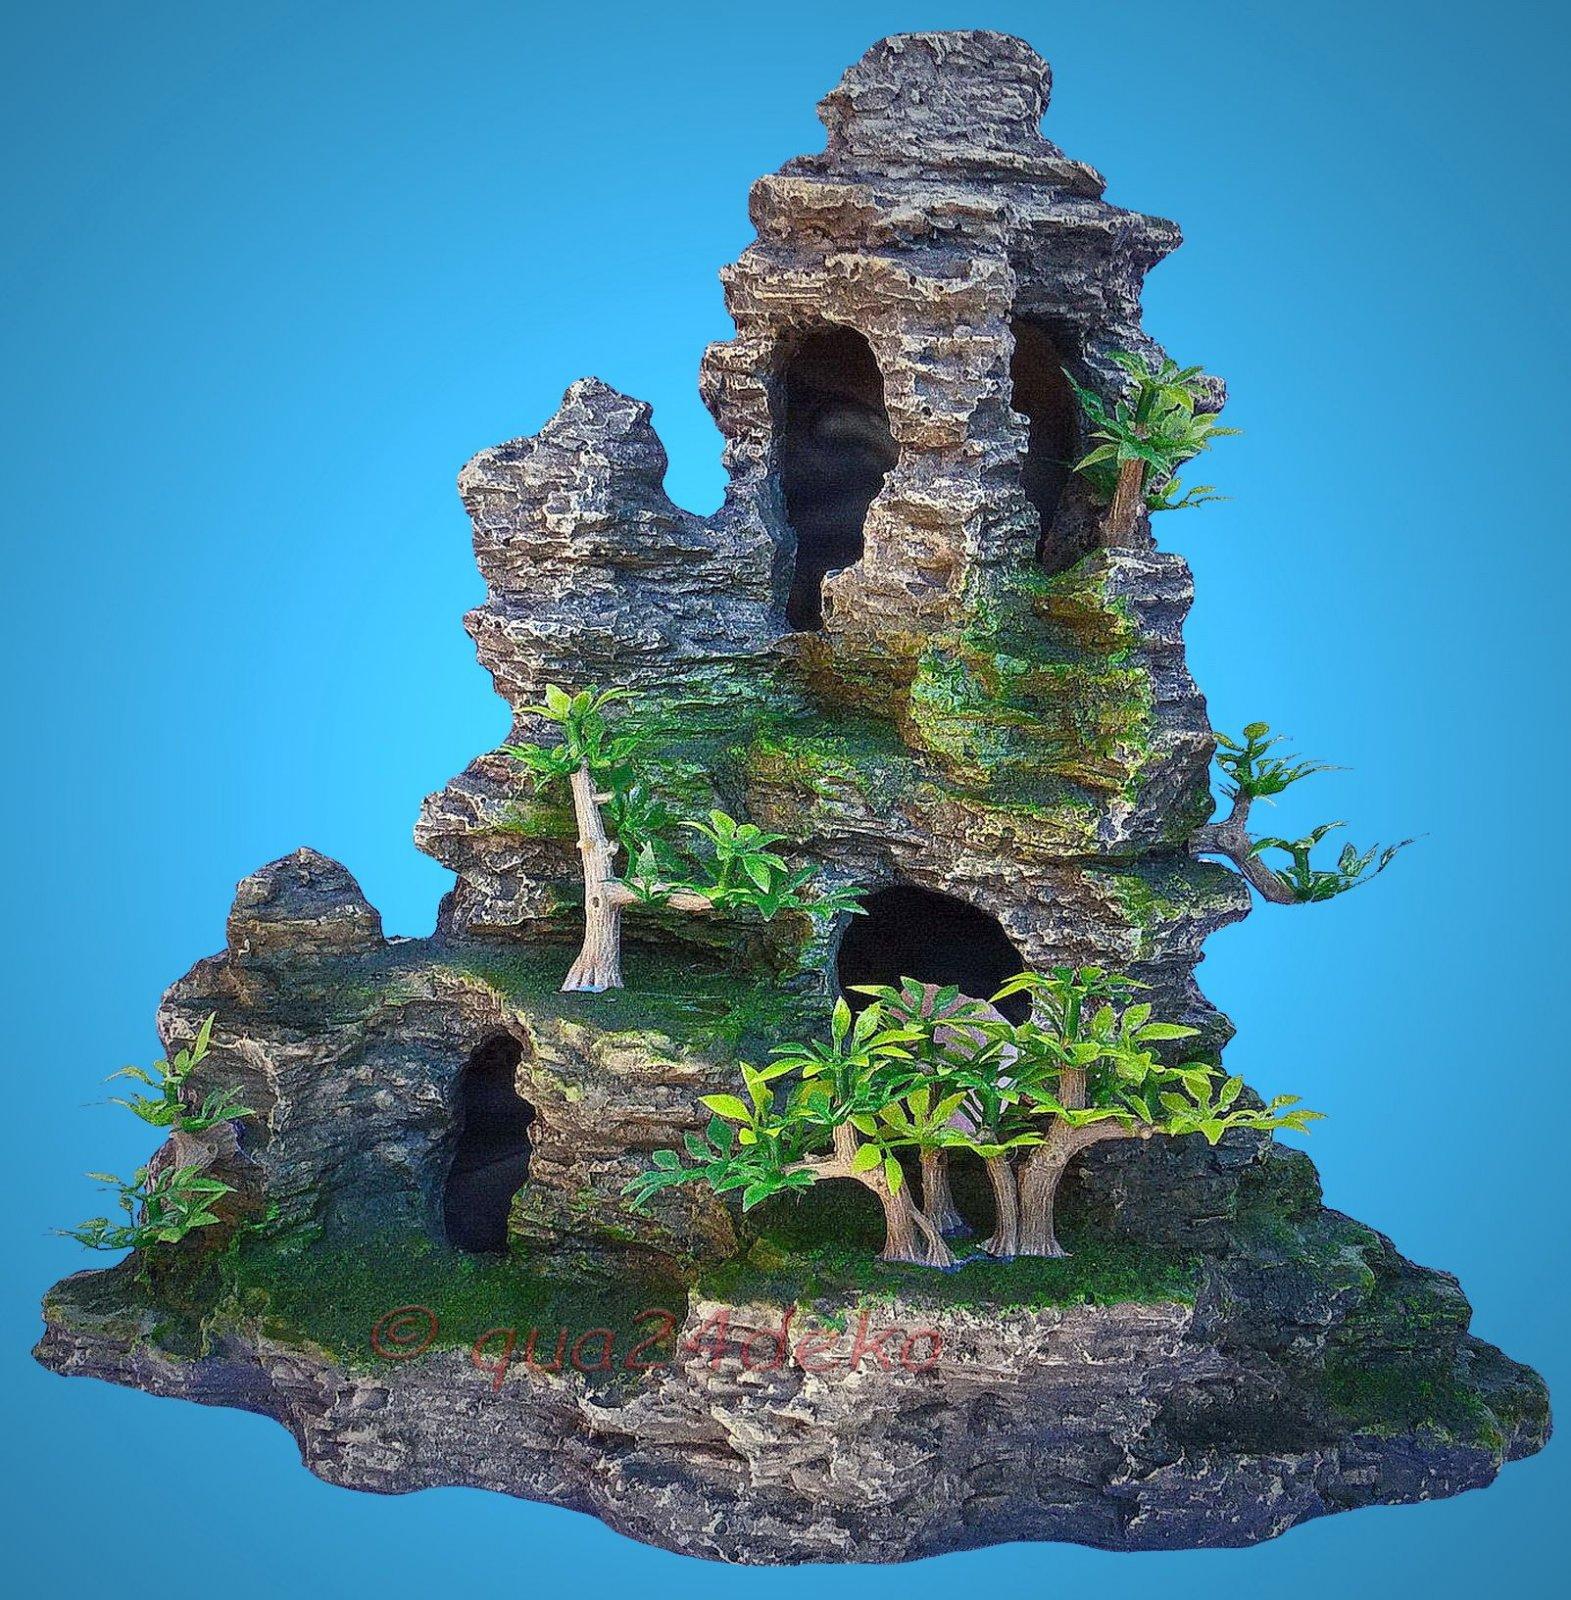 aquarium deko grotten fels laich h hle versteck terrarium dekoration zubeh r ebay. Black Bedroom Furniture Sets. Home Design Ideas